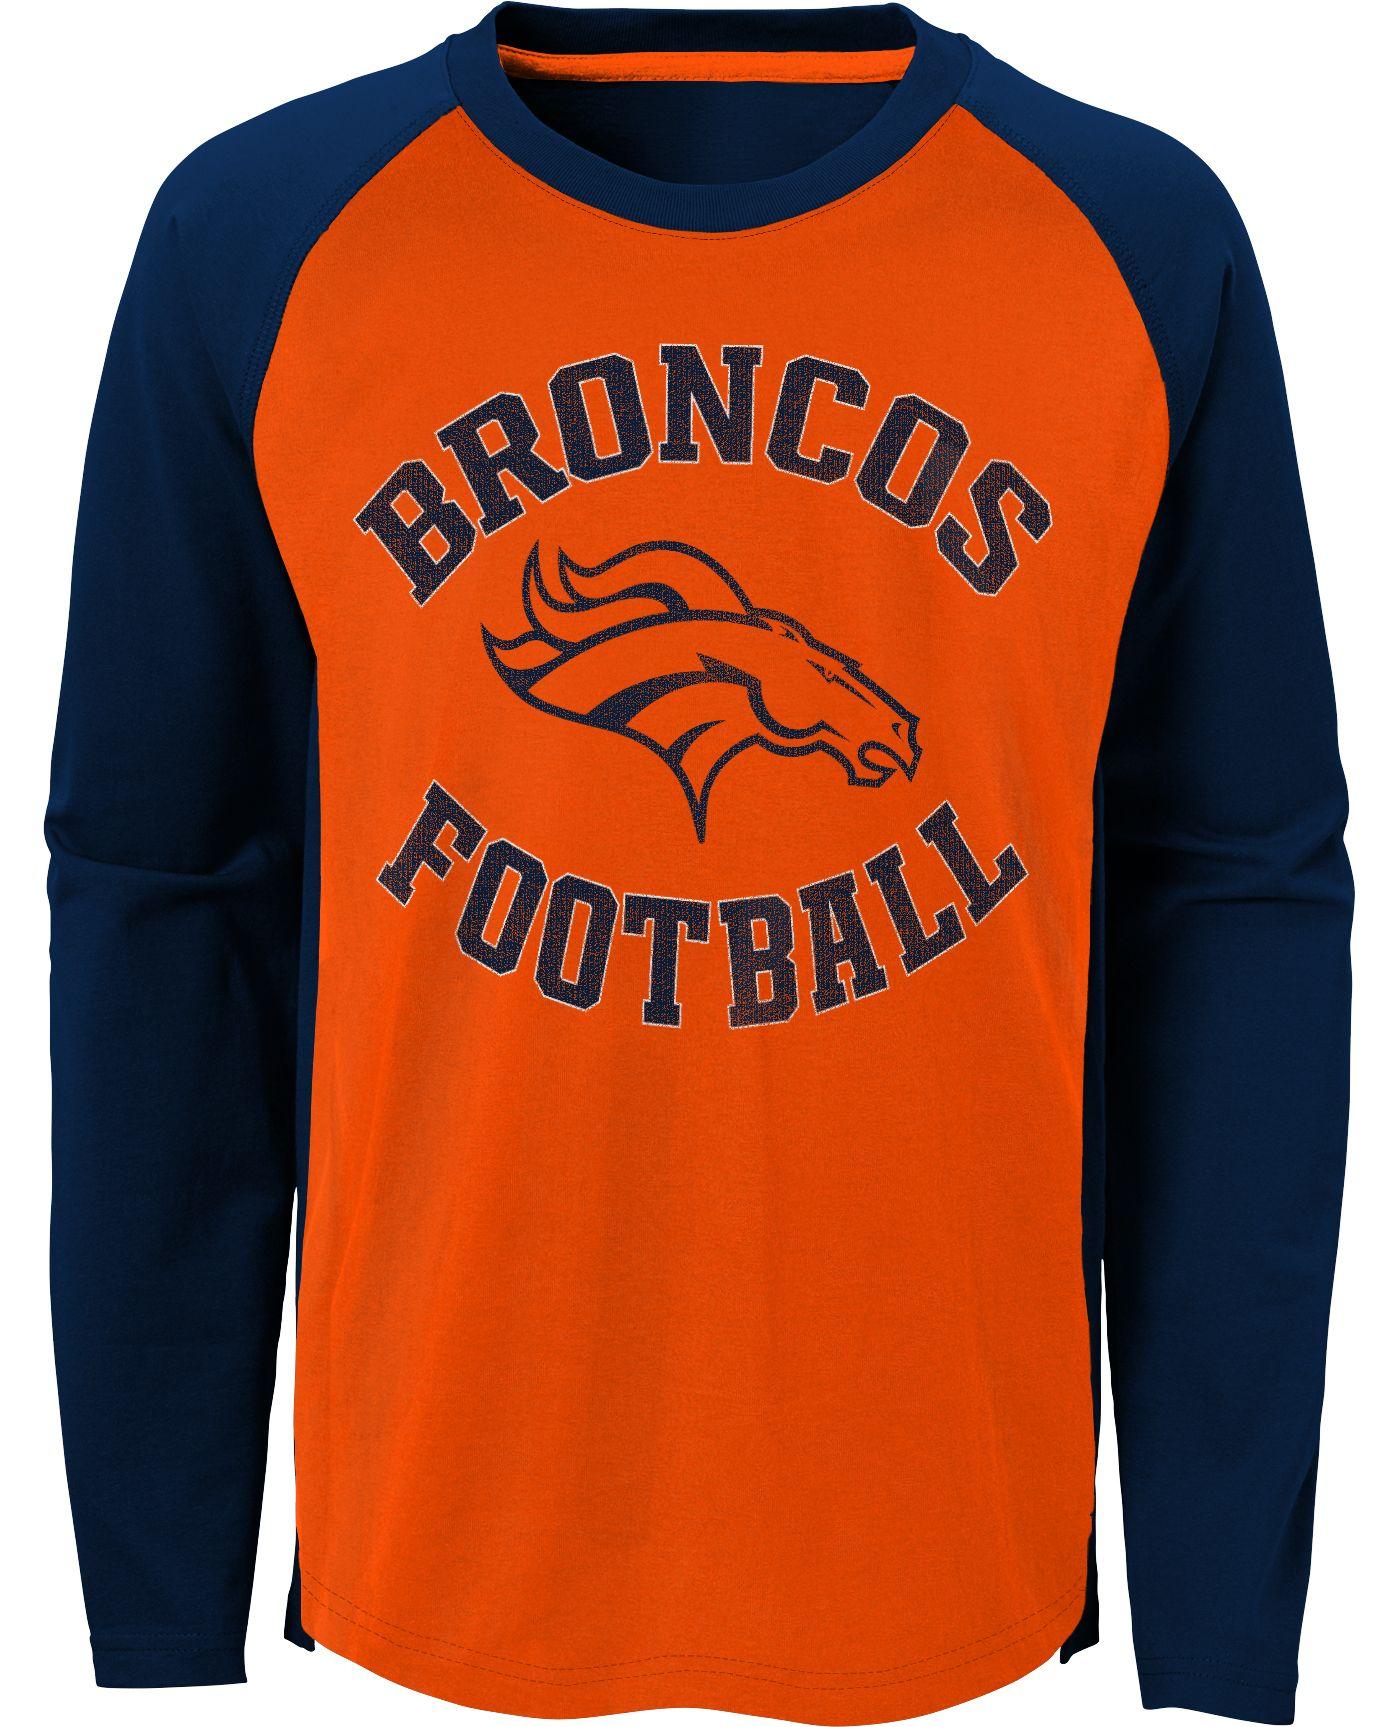 NFL Team Apparel Youth Denver Broncos Air Raid Long Sleeve Orange Shirt